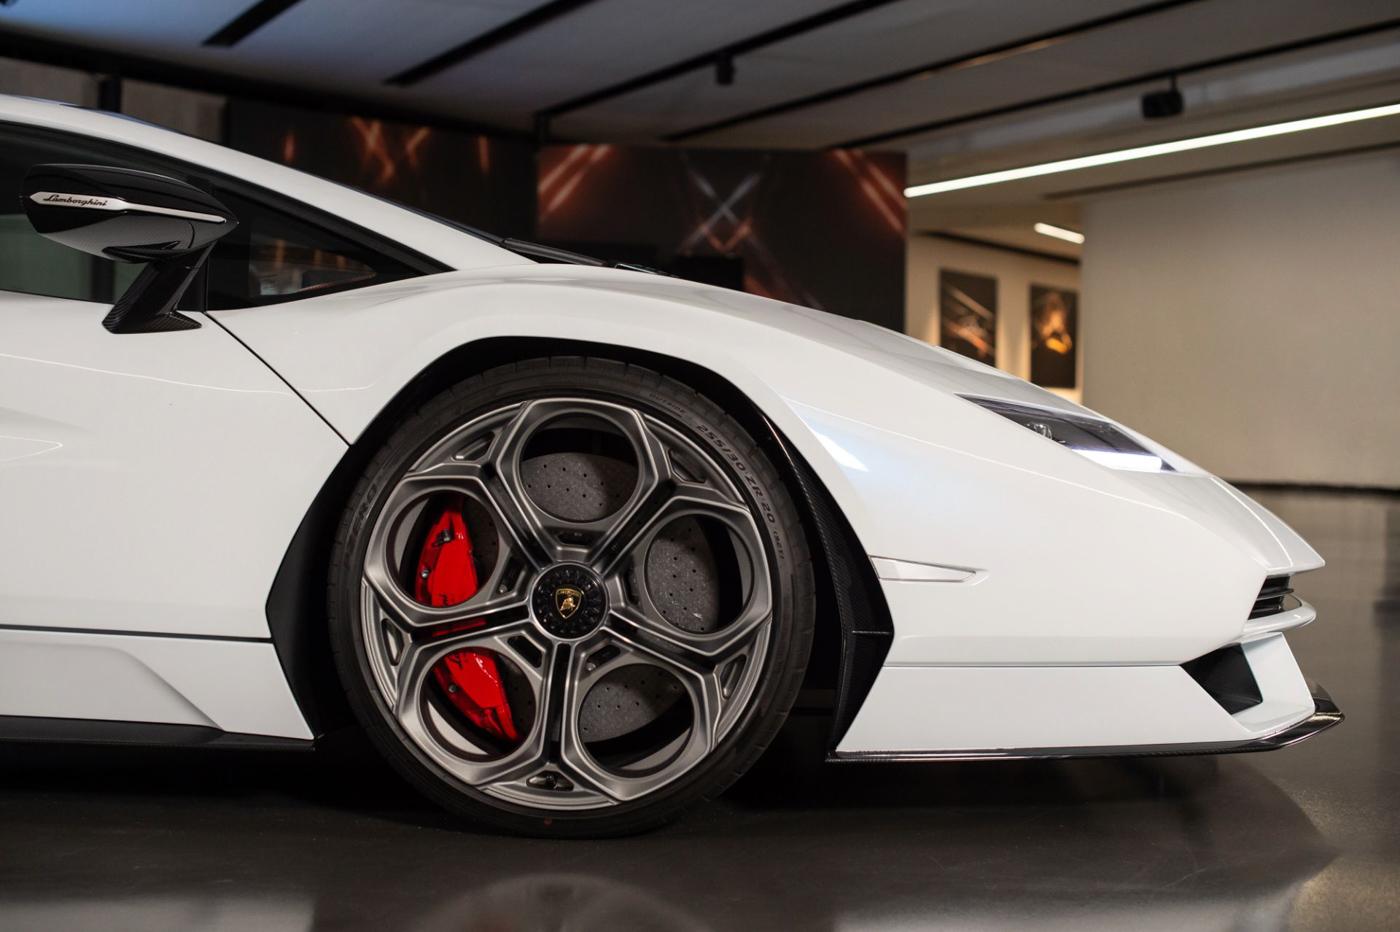 Lamborghini Countach LPI 800-4 (17).JPG